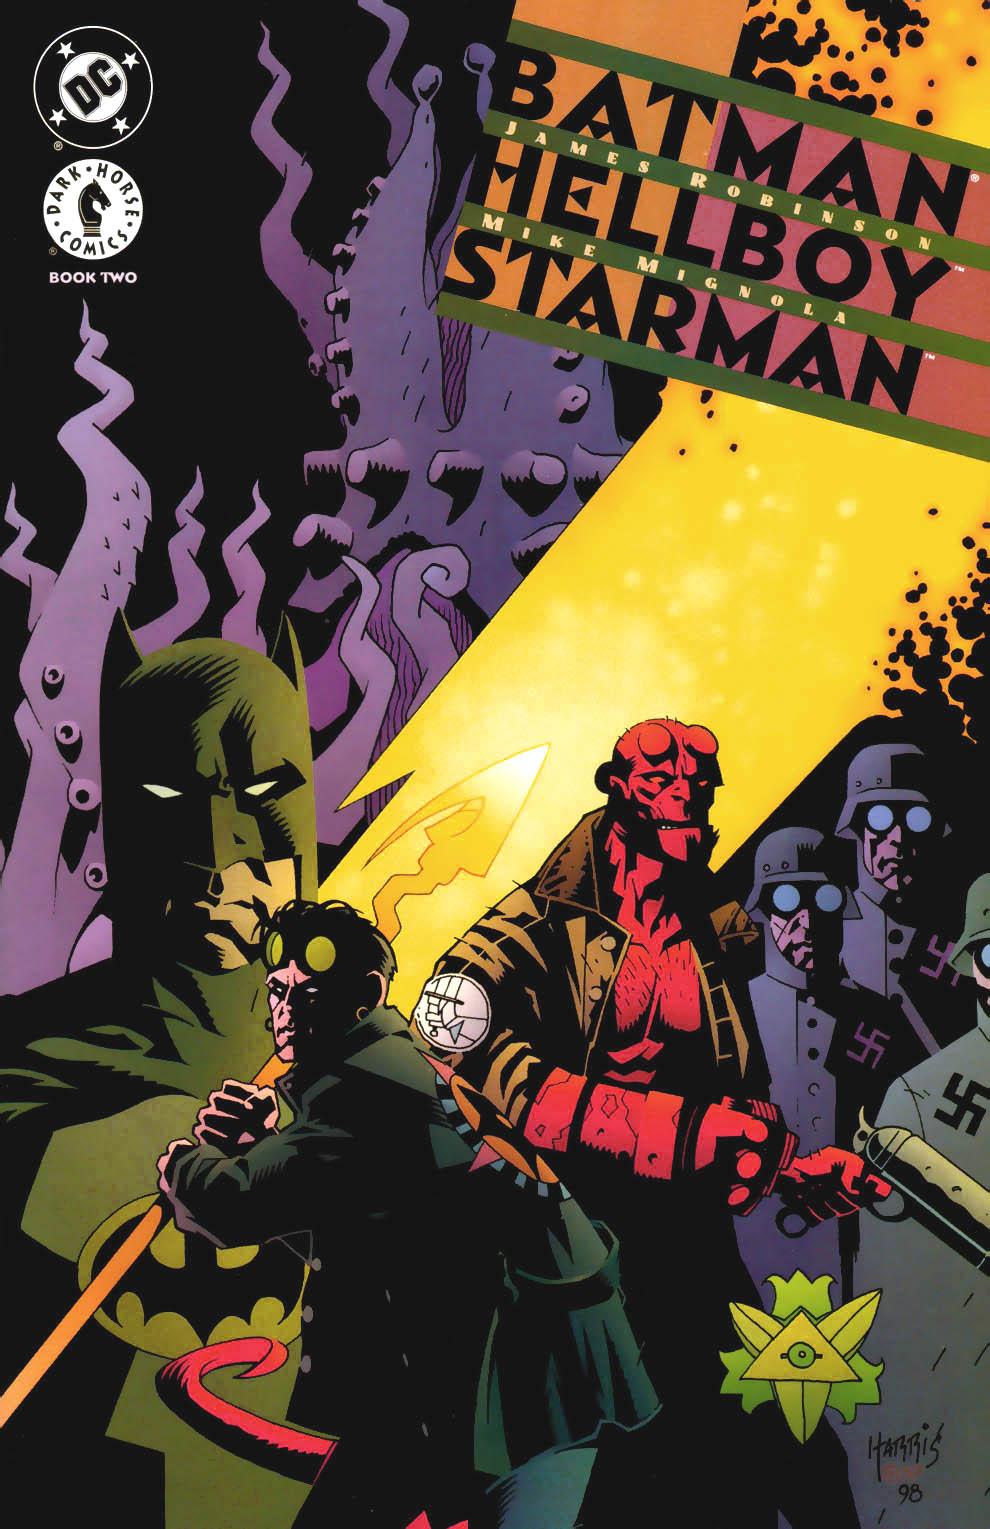 Hellboy in DC comics